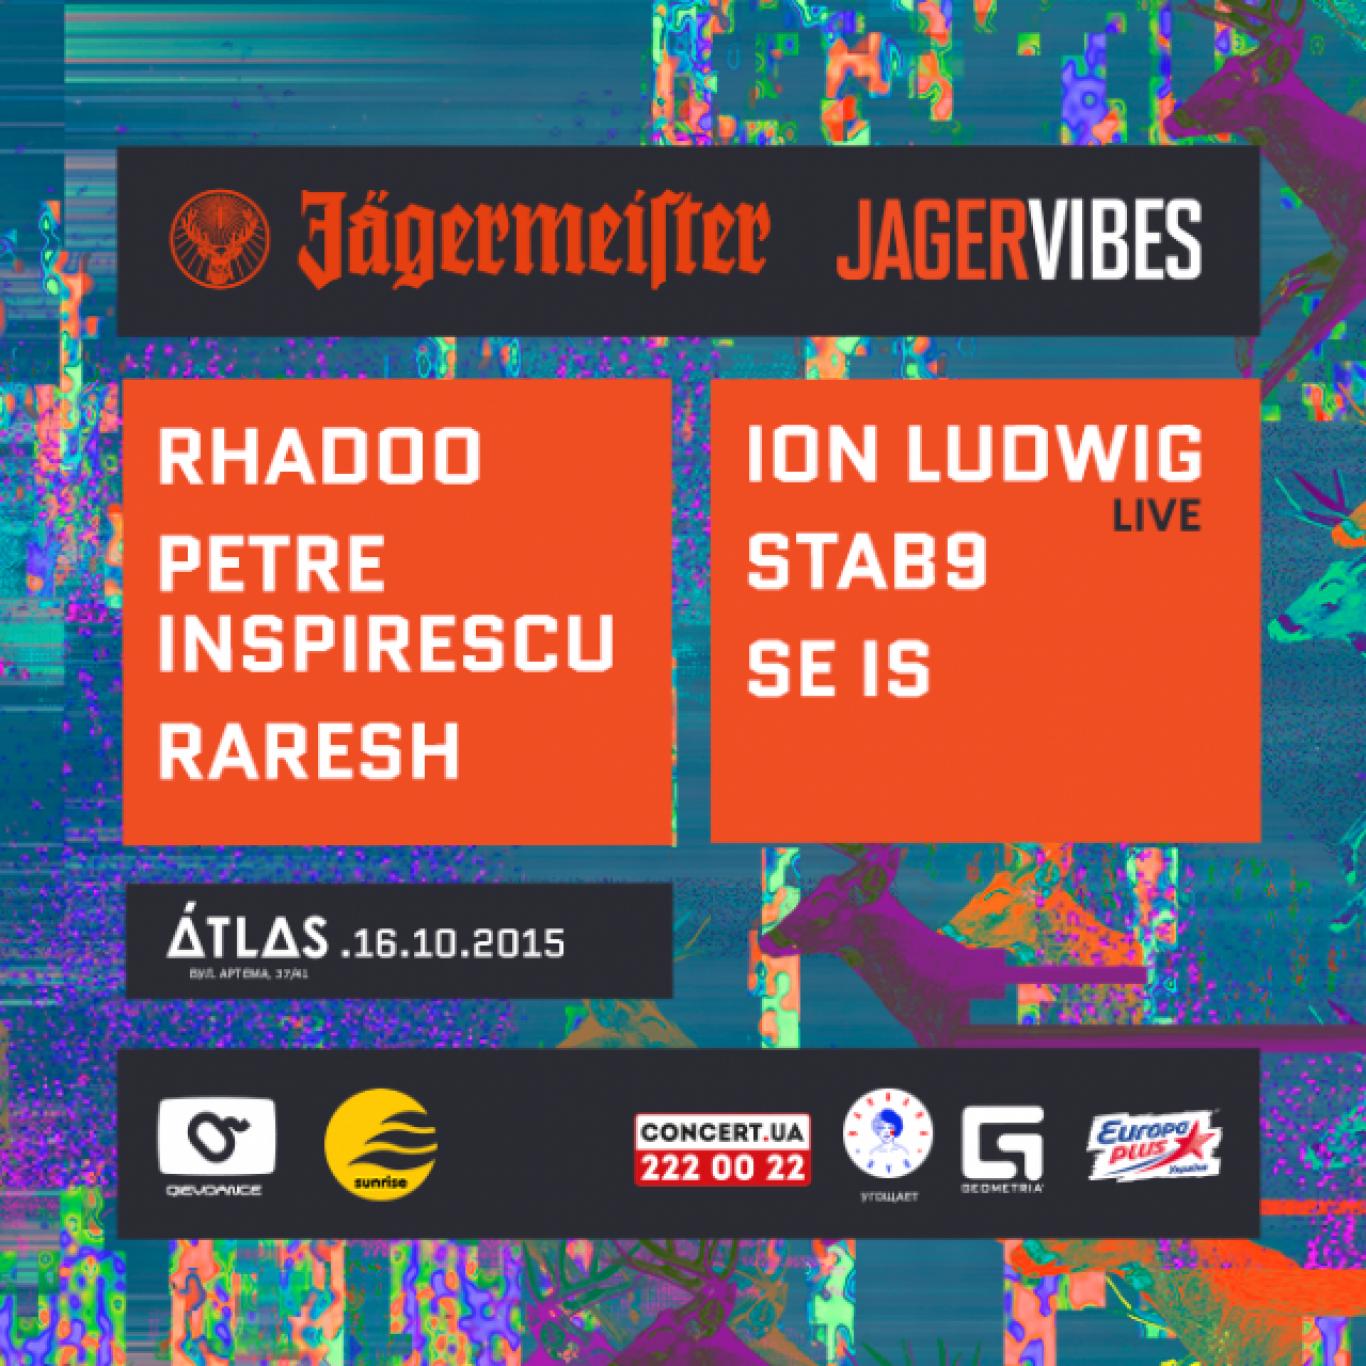 Вечірка JAGER VIBES by Jagermeister в клубі Atlas